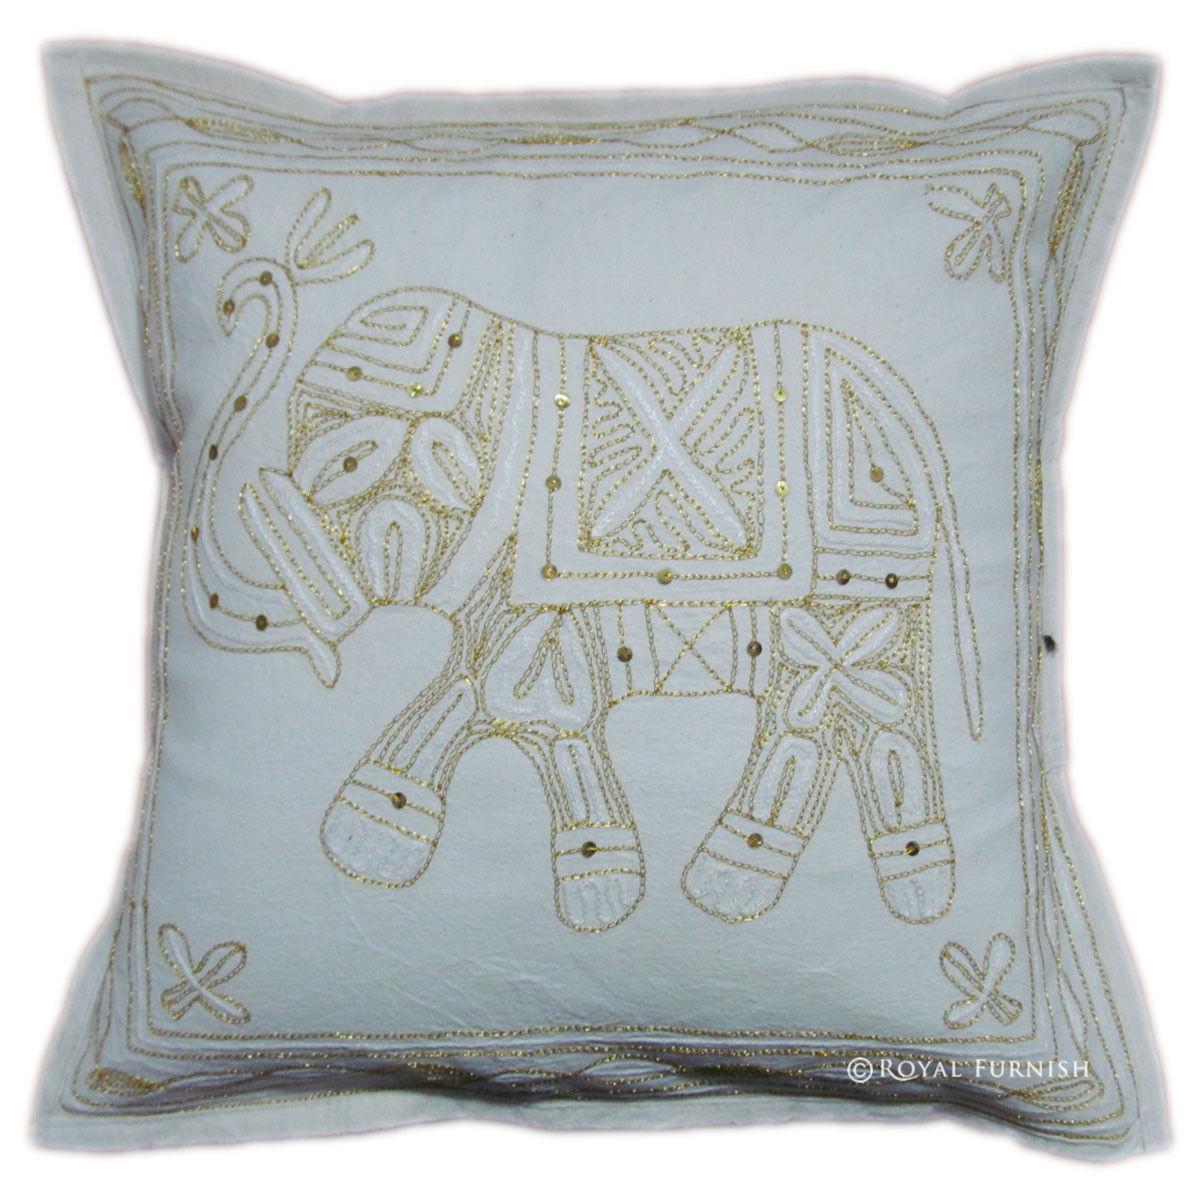 Embroidered Decorative Pillow : Handicraft Elephant Golden Thread Hand Embroidered Decorative Throw Pillow - RoyalFurnish.com